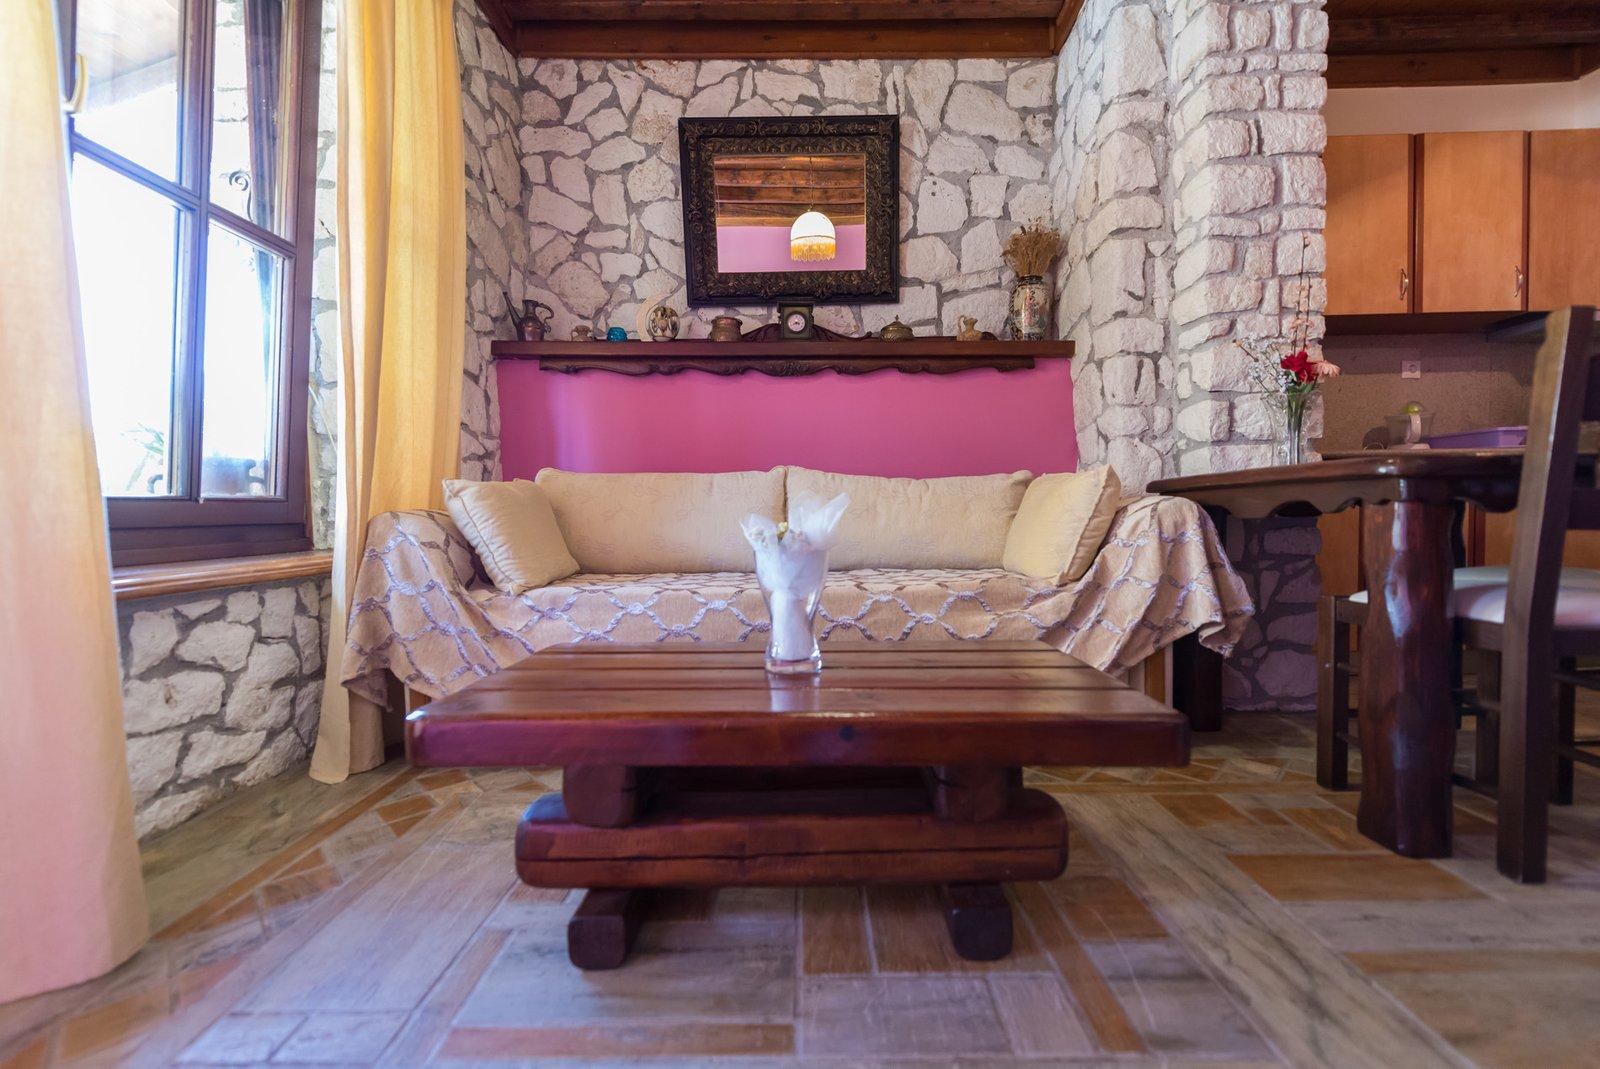 Laertis living room